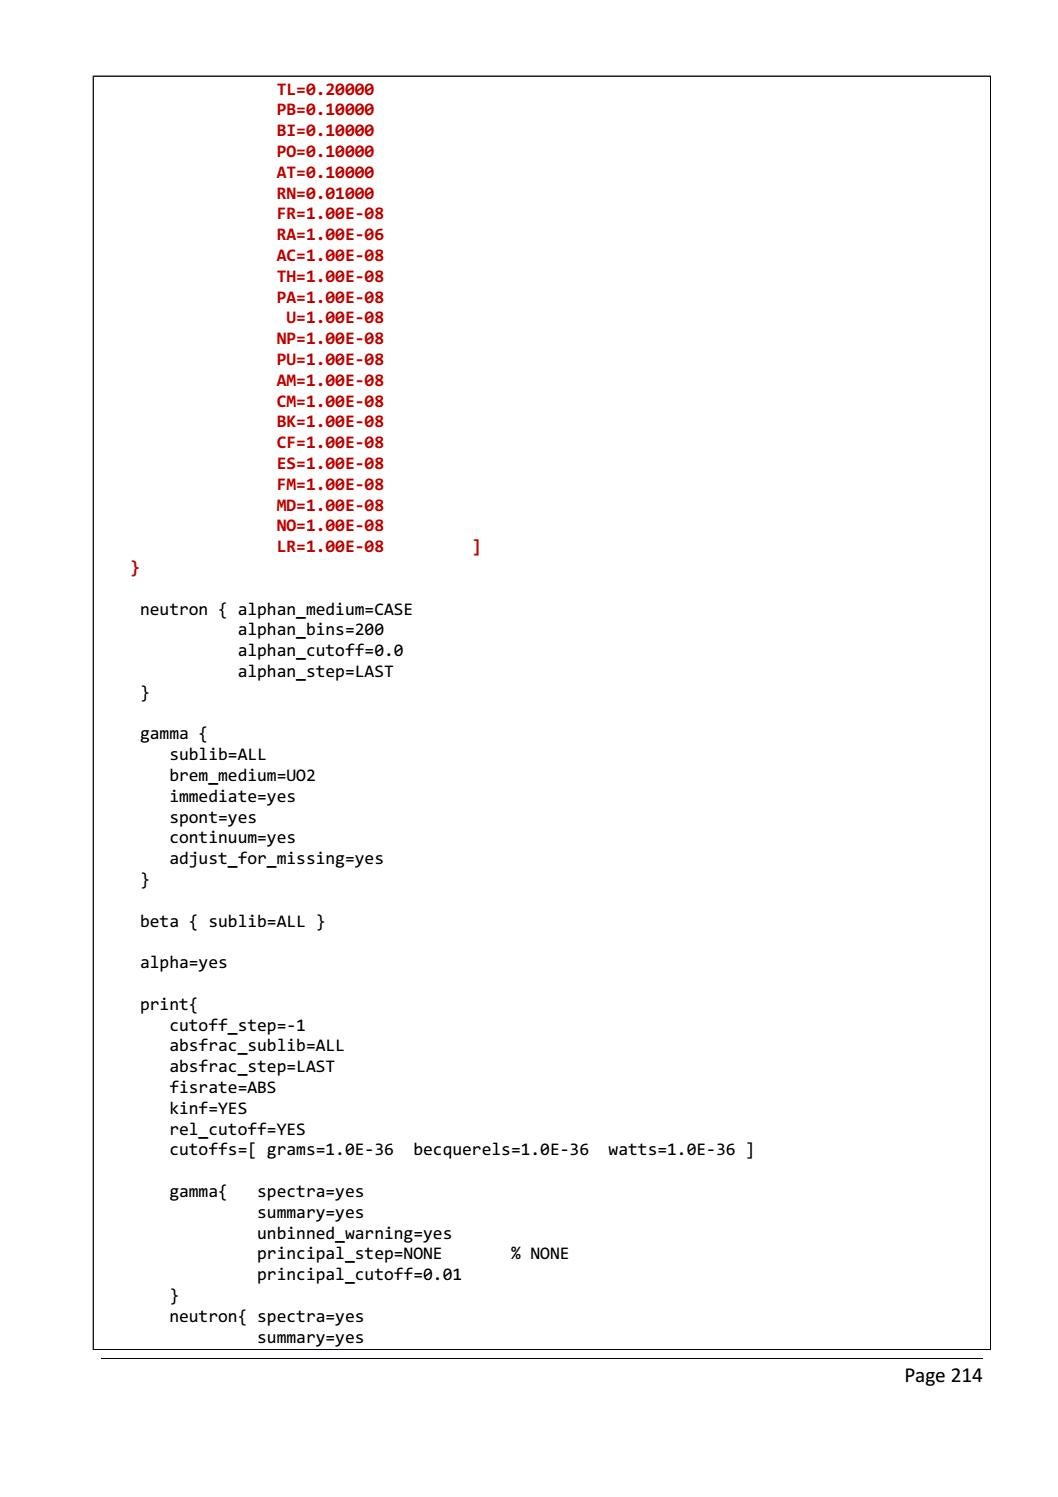 RADIOACTIVE WASTE: COMPUTATIONAL CHARACTERISATION and SHIELDING page 239